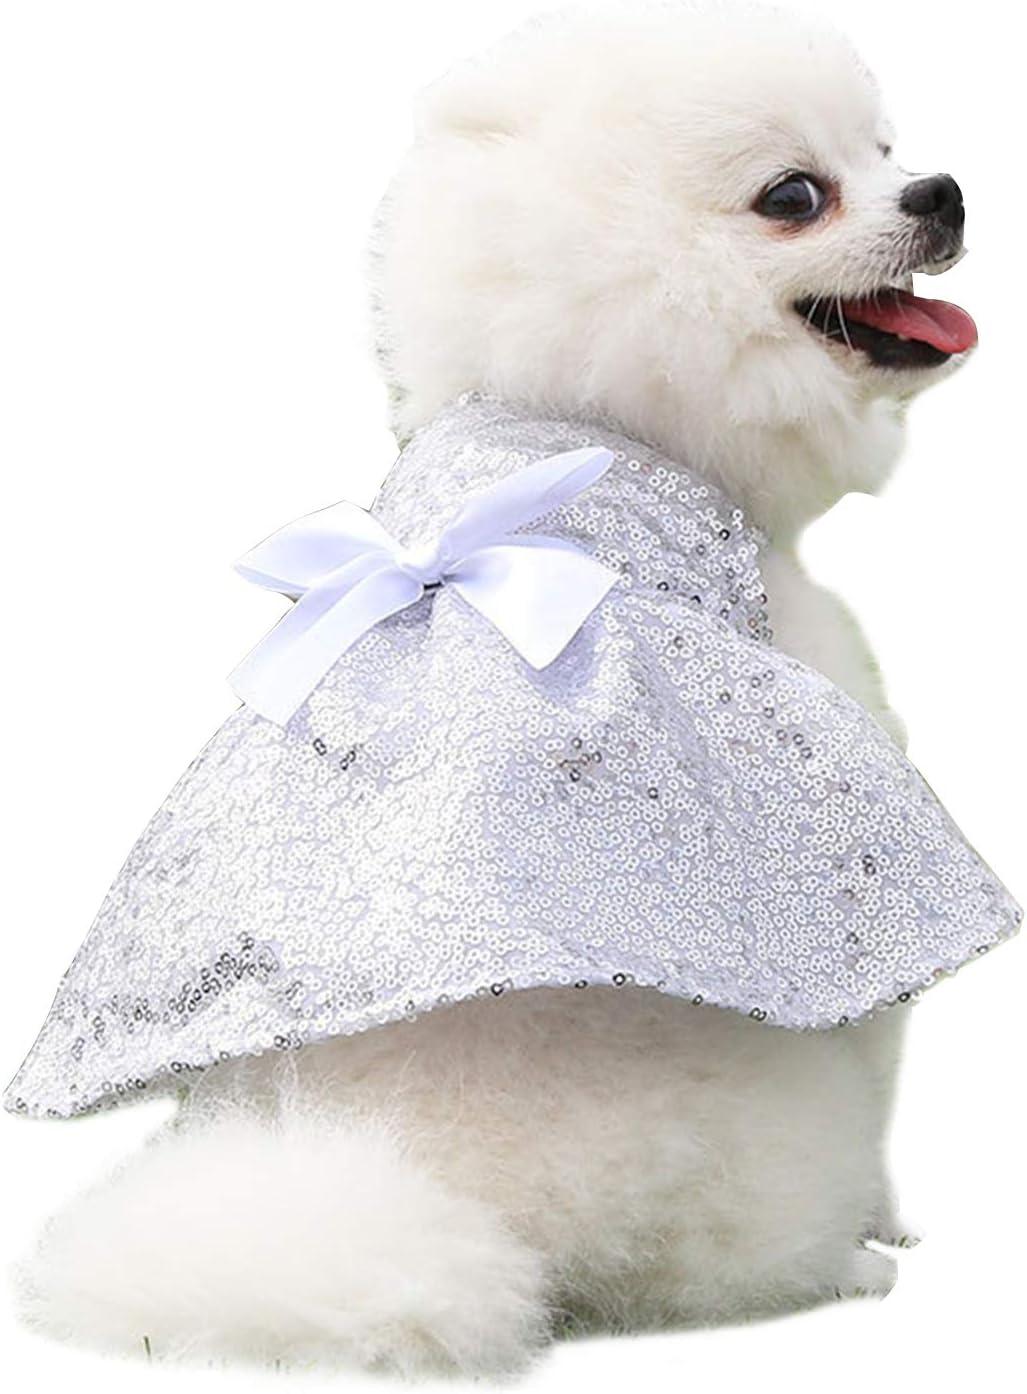 Pet Clothes Dog Princess Cheap SALE Start Dress Costume Super popular specialty store Puppy Party Wedding Tutu